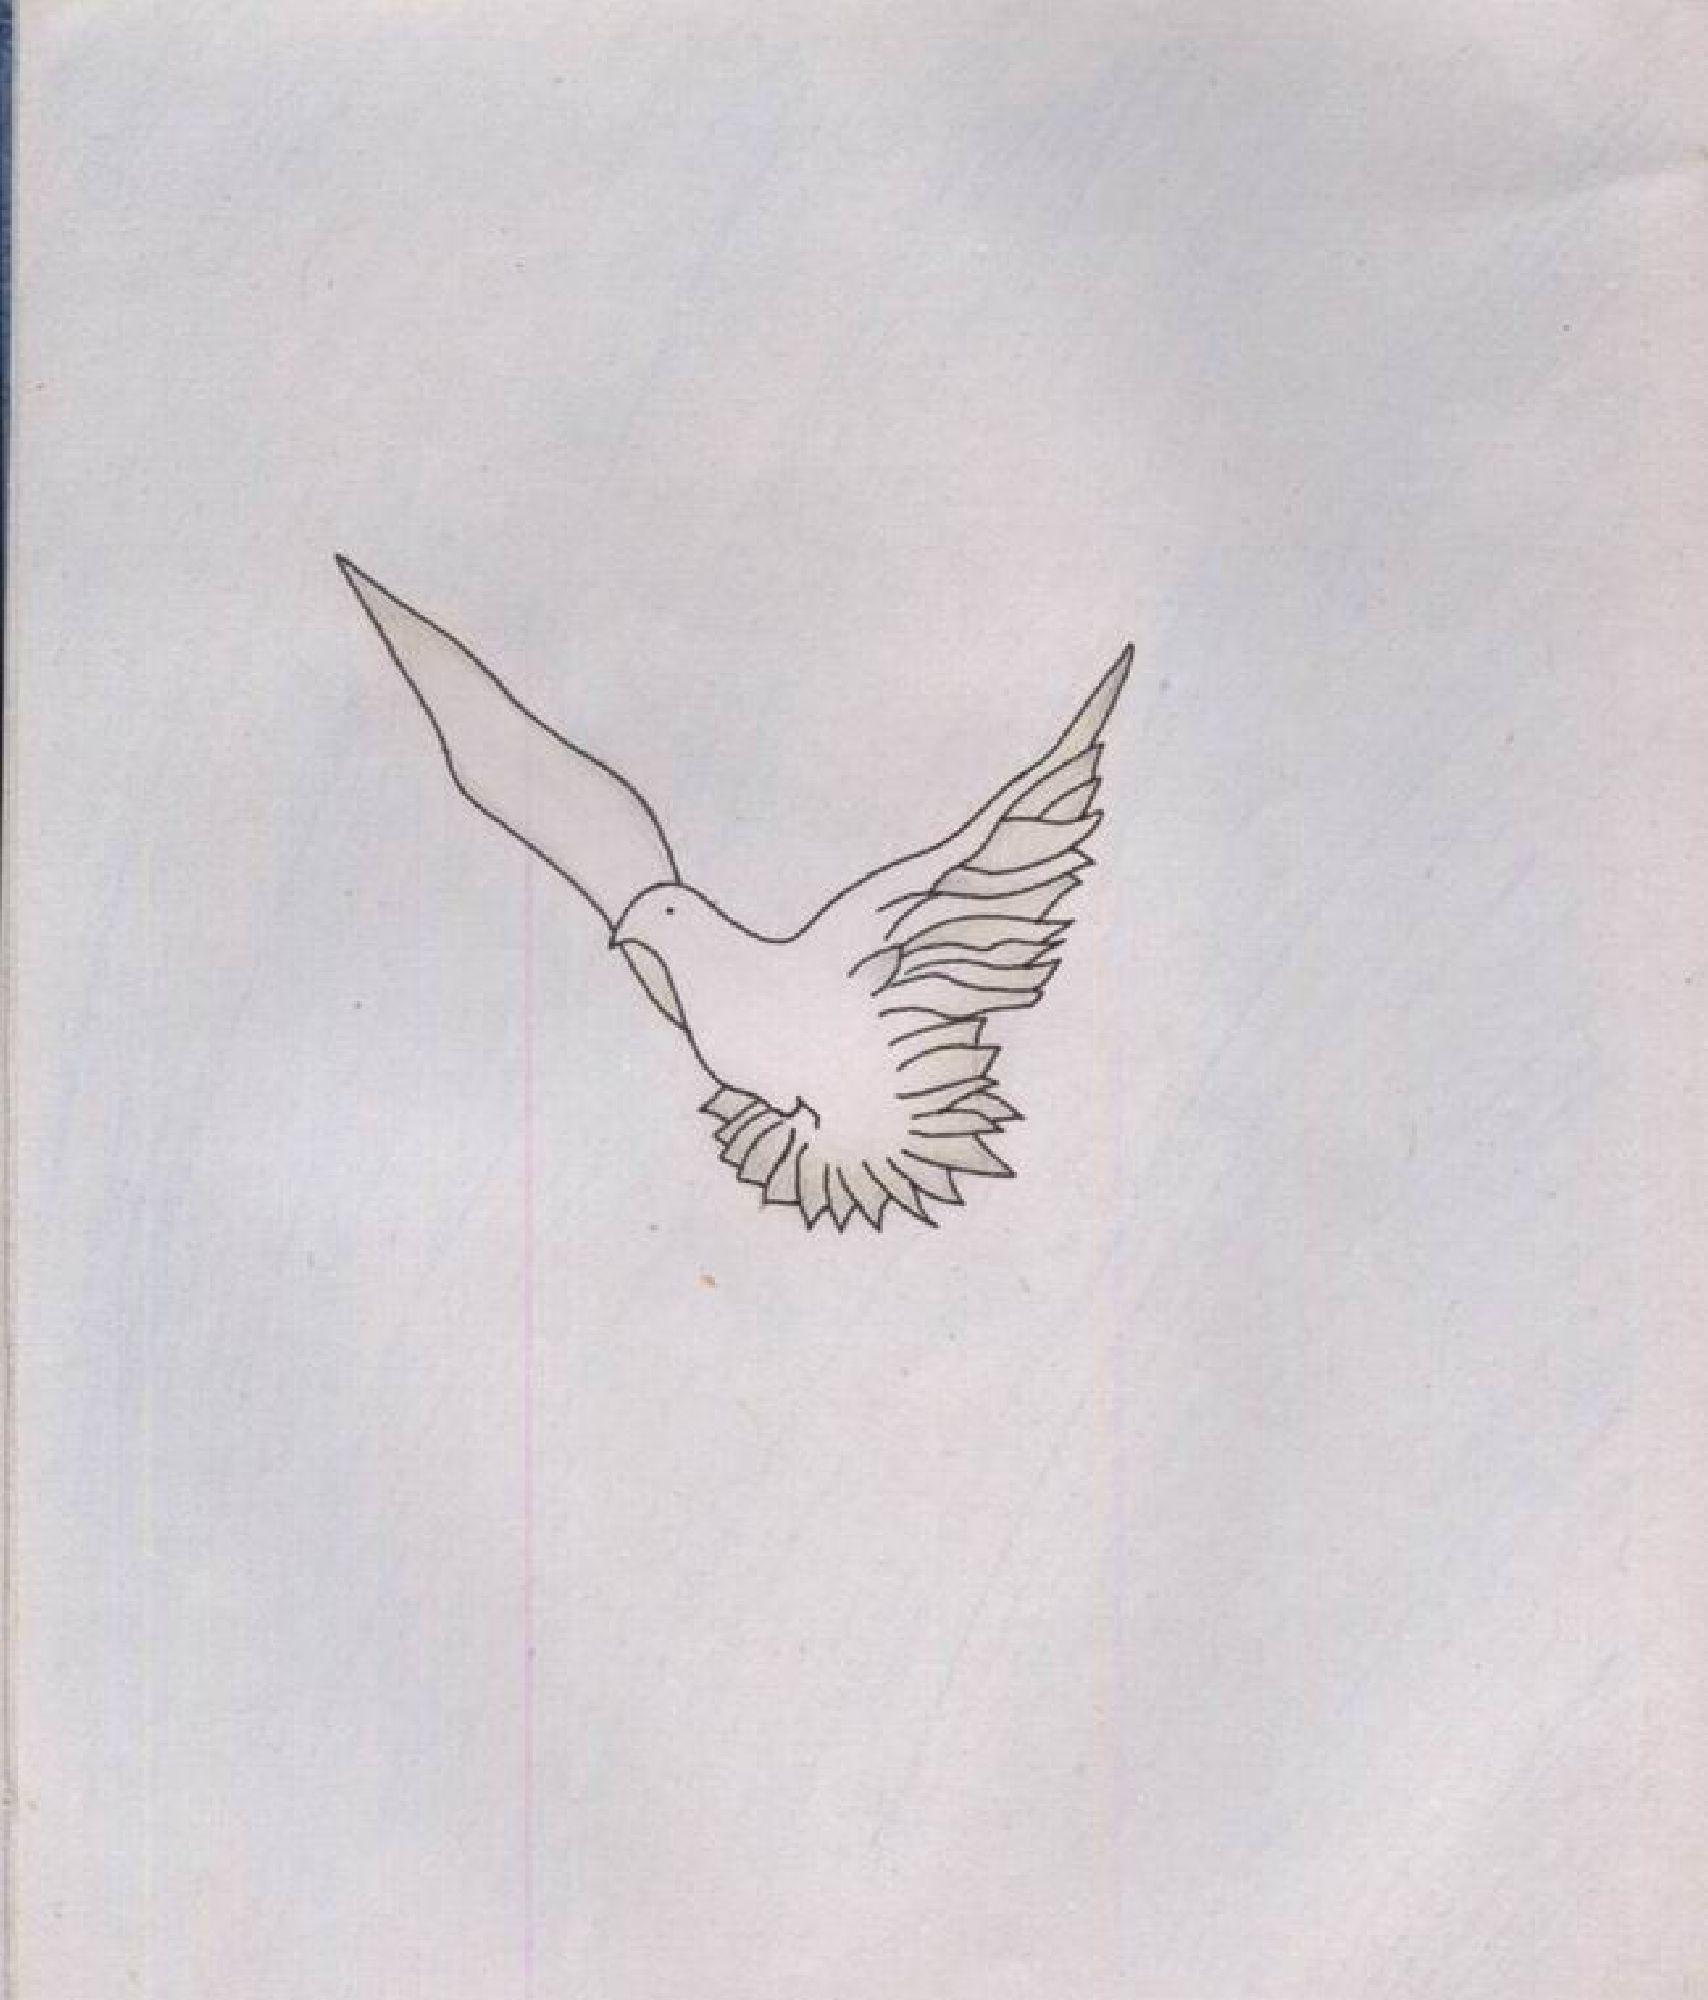 Pigeon drawing, Artwork, Bird, Drawing, Fly, HQ Photo